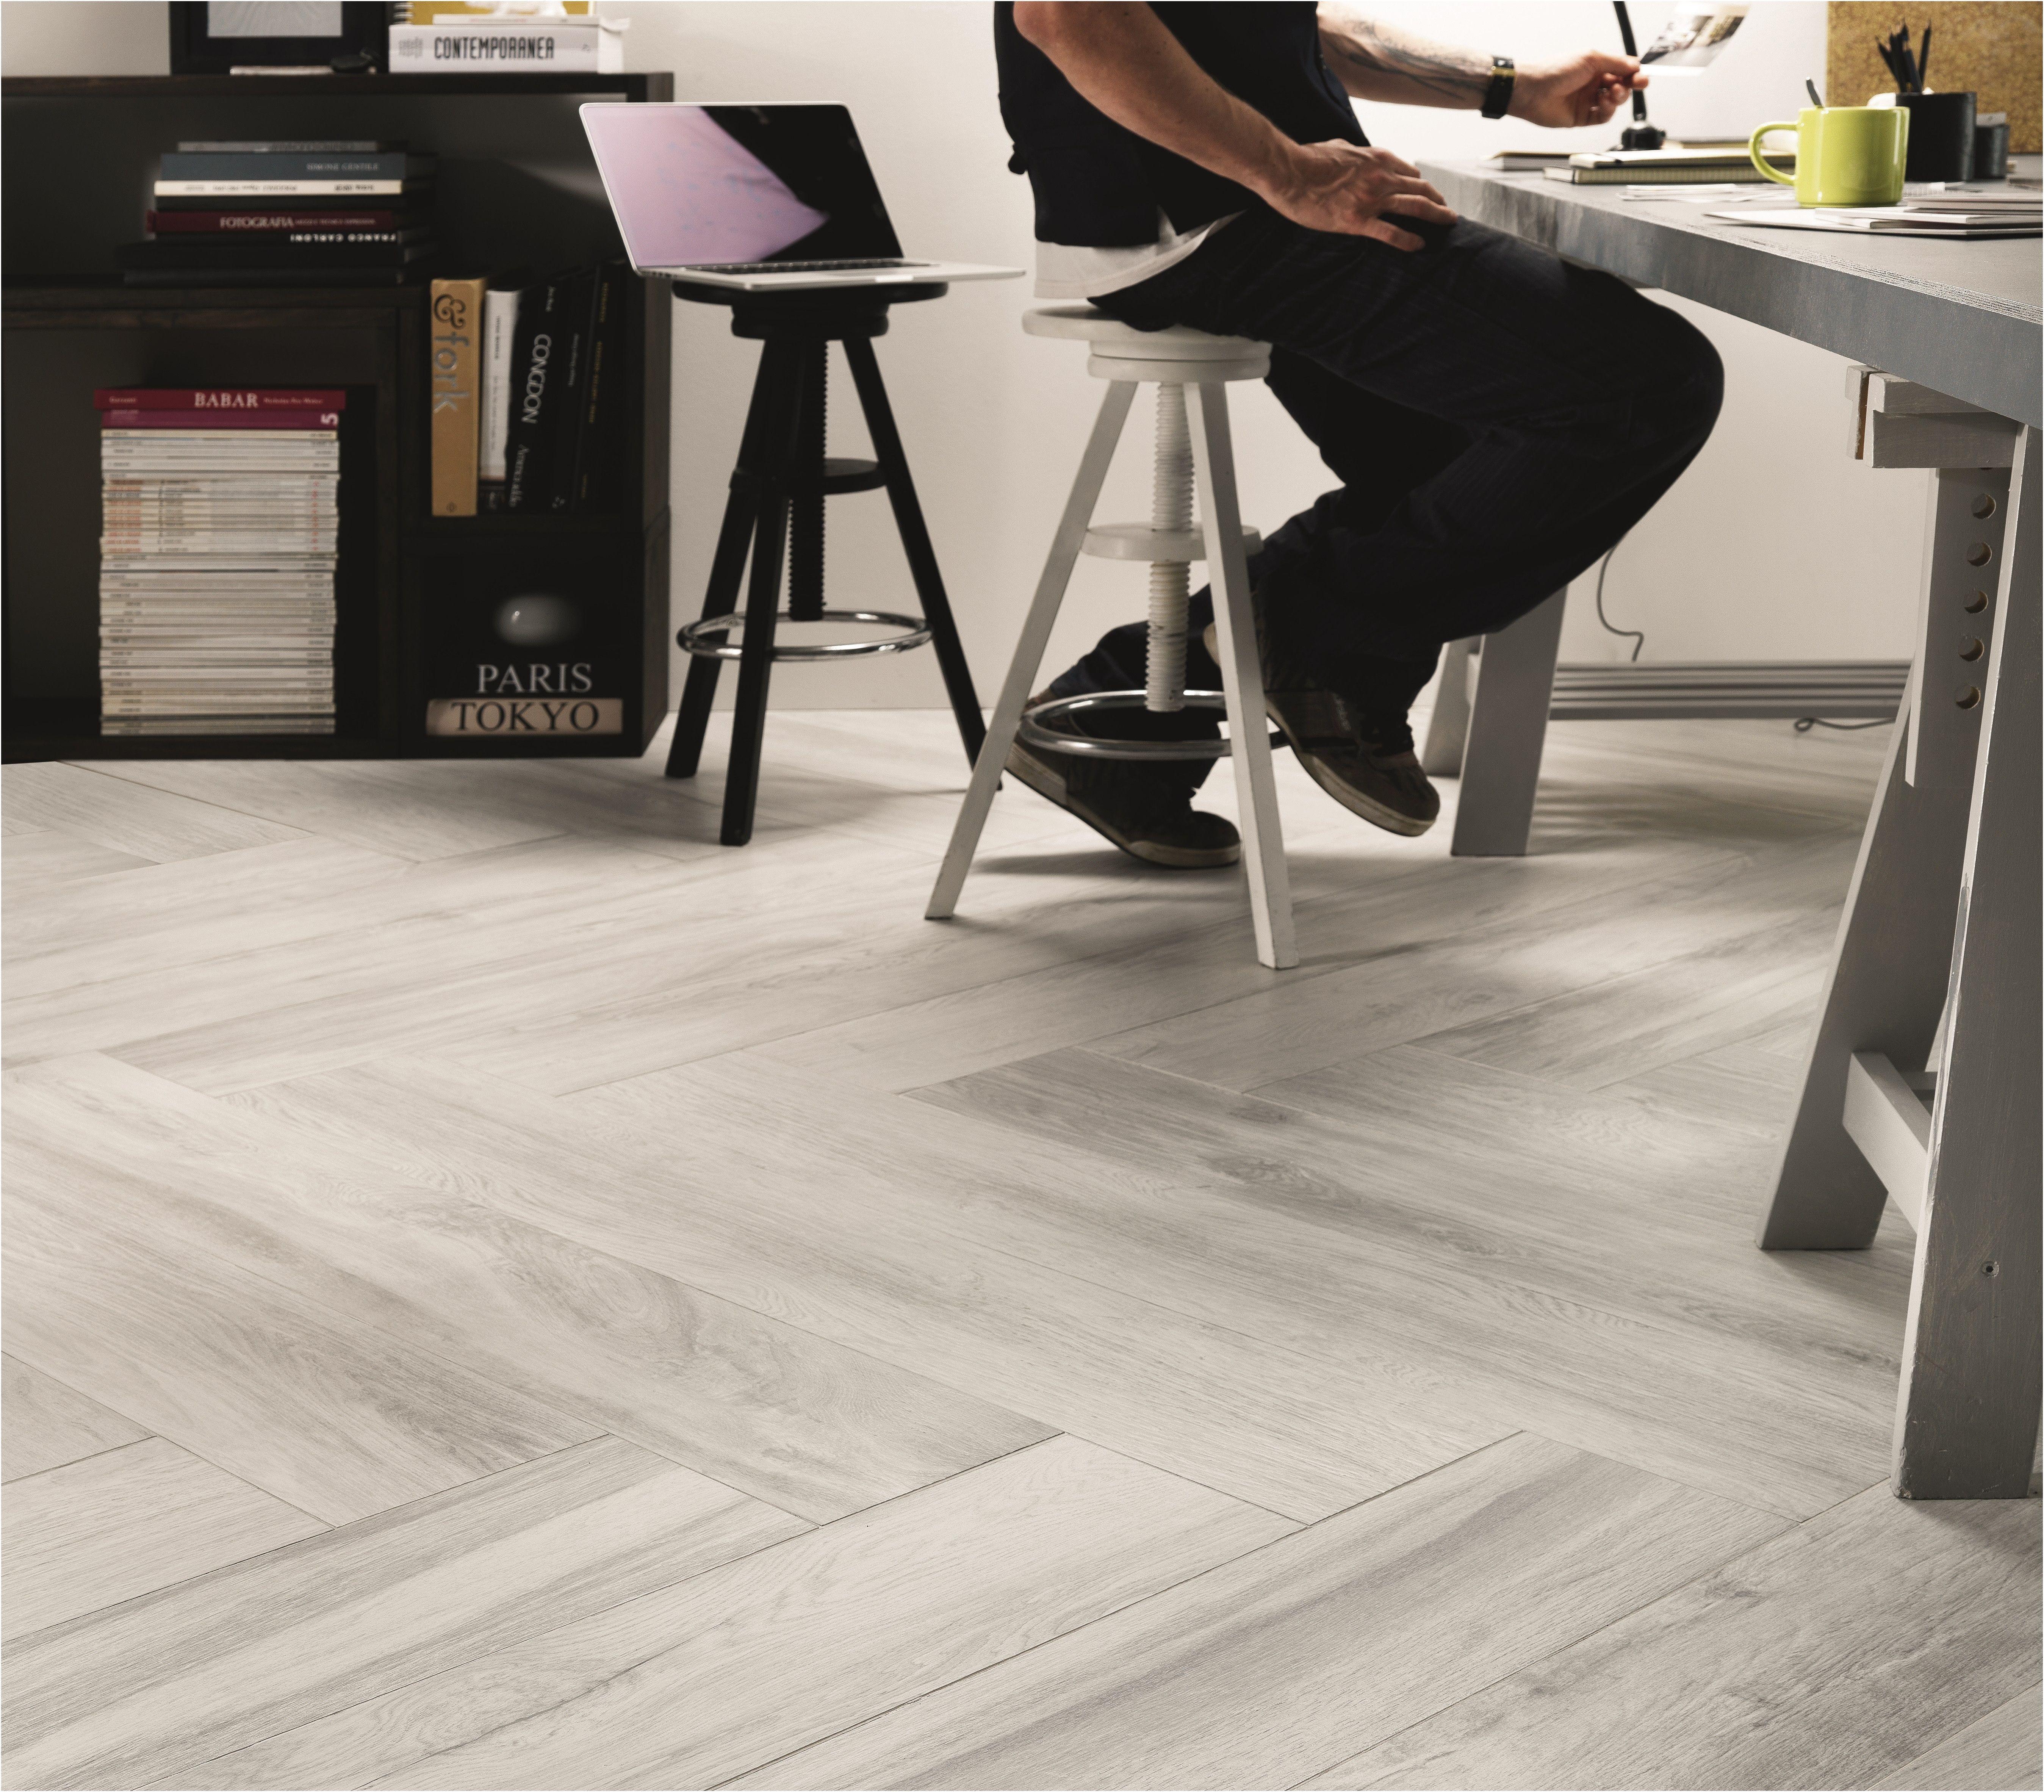 hardwood floors vs wood look tile of wood effect floor tiles wood effect porcelain tiles pertaining to wood effect floor tiles wood effect porcelain tiles